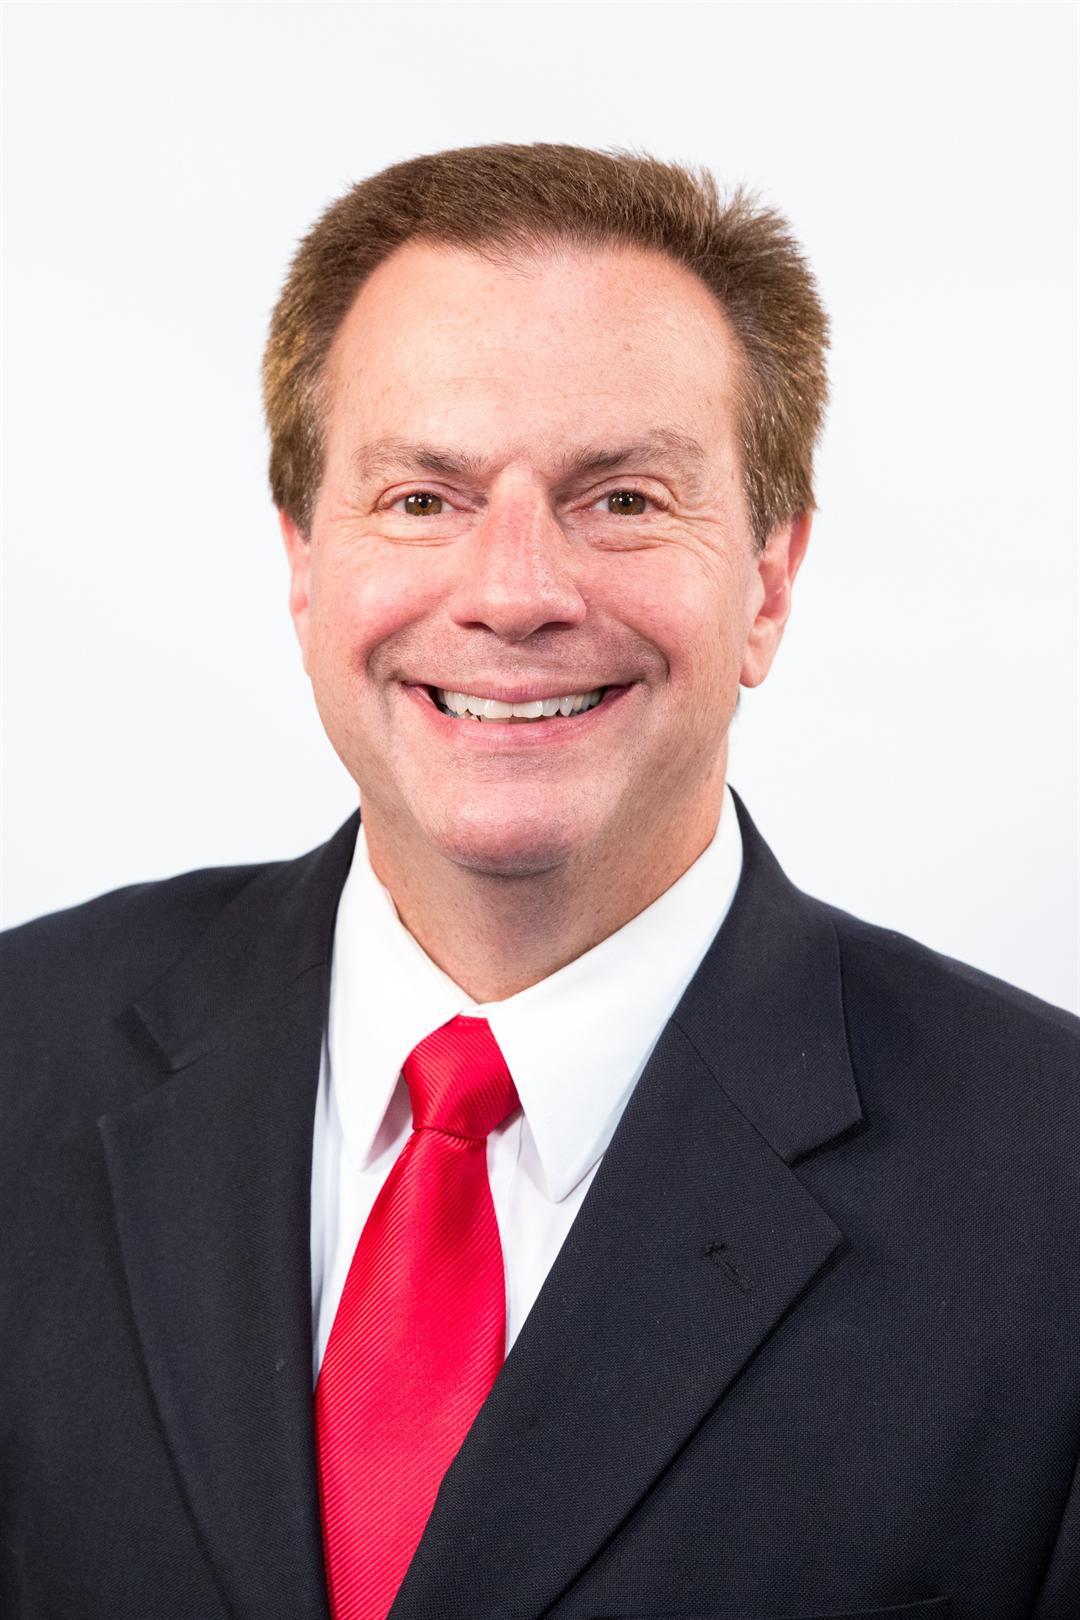 Mike Ruzzi